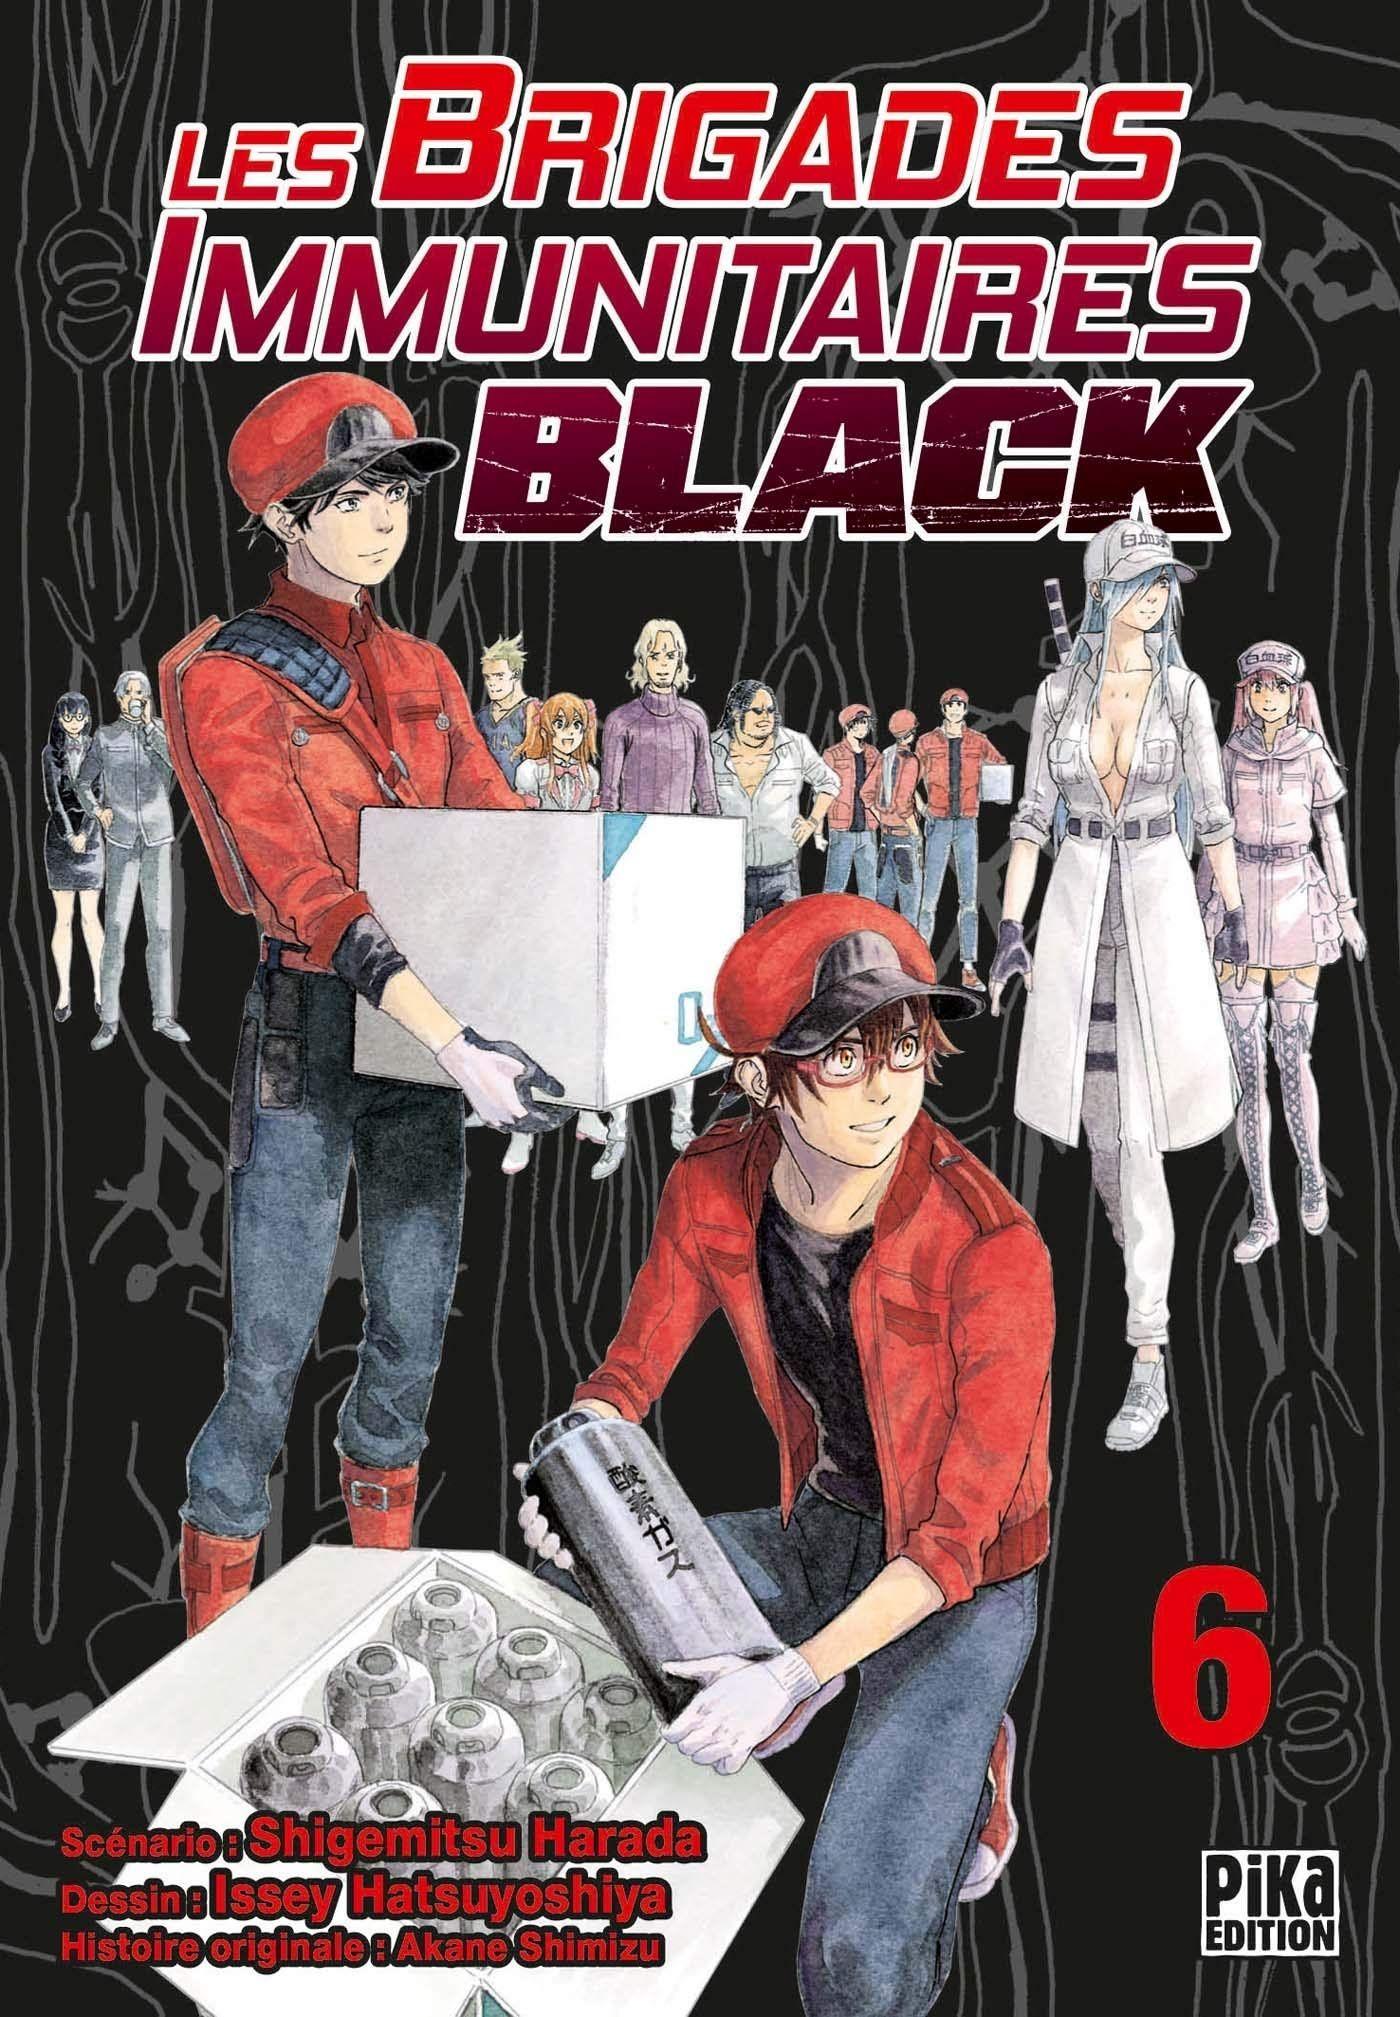 Sortie Manga au Québec JUIN 2021 Brigadess-immunitaires-black-6-pika